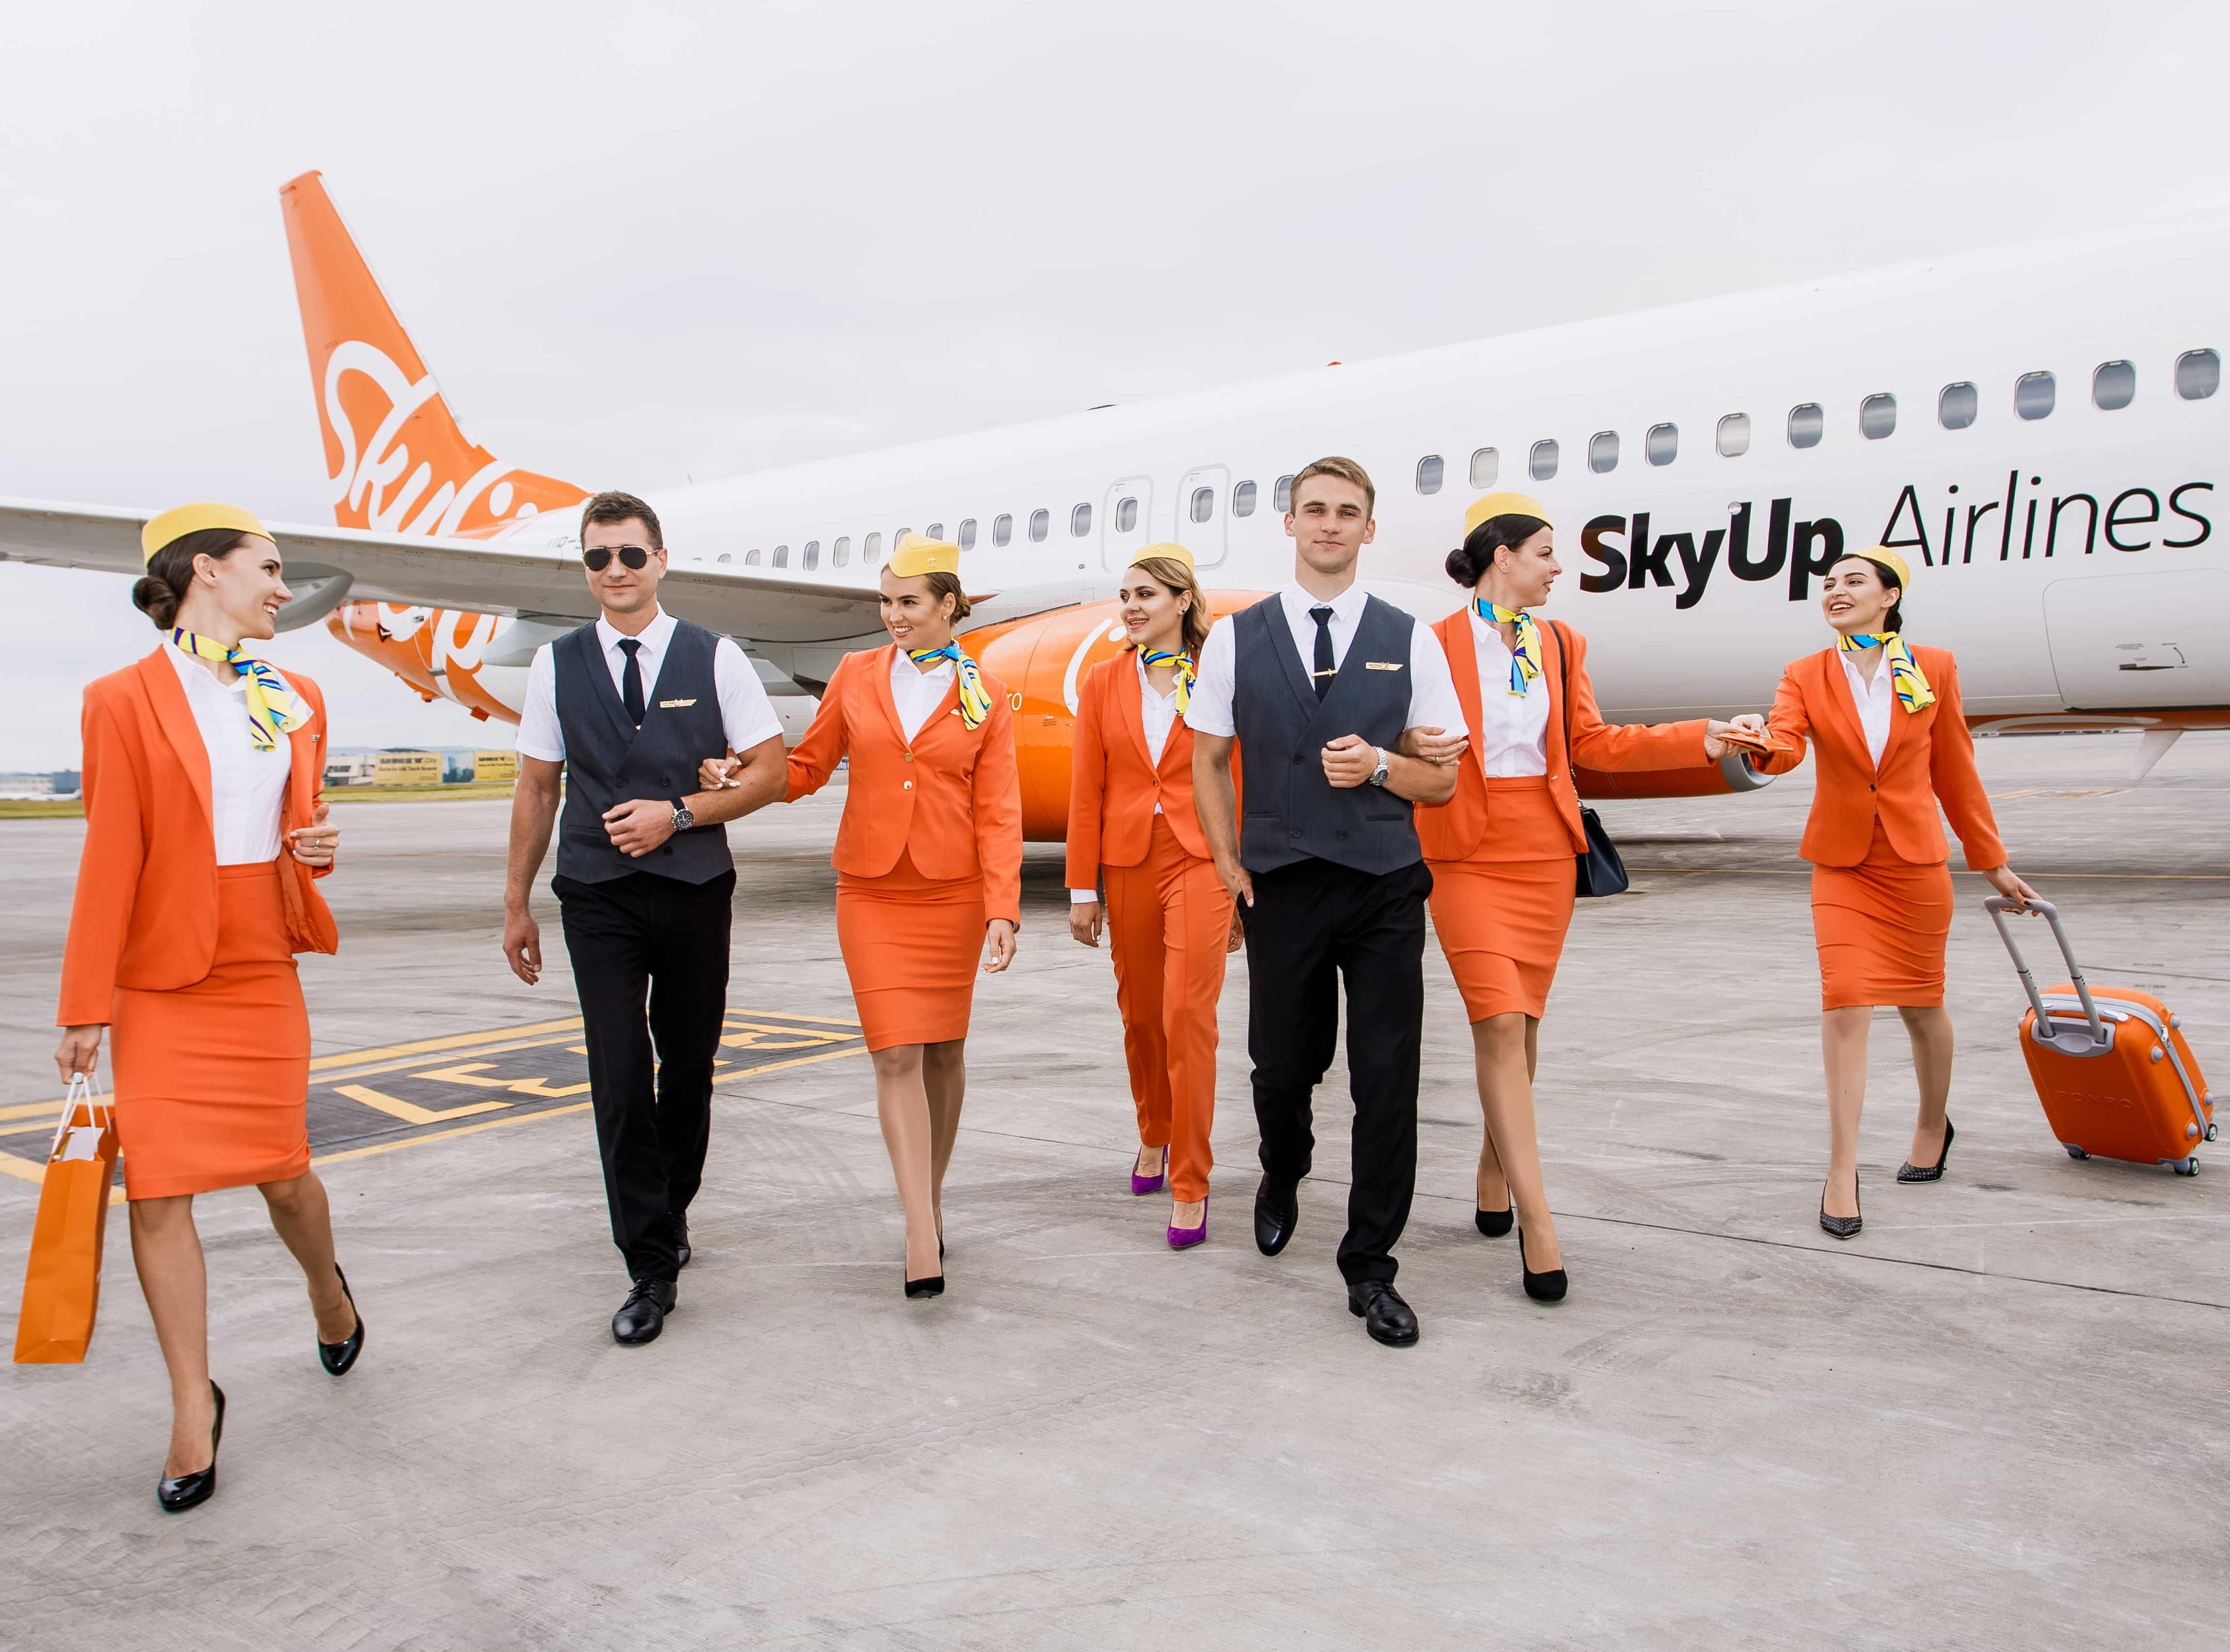 harkove-welcome-u-aboard-zaproshuyemo-bortprovidnikiv-ta-pilotiv-na-znajomstvo-zi-skyup-airlines